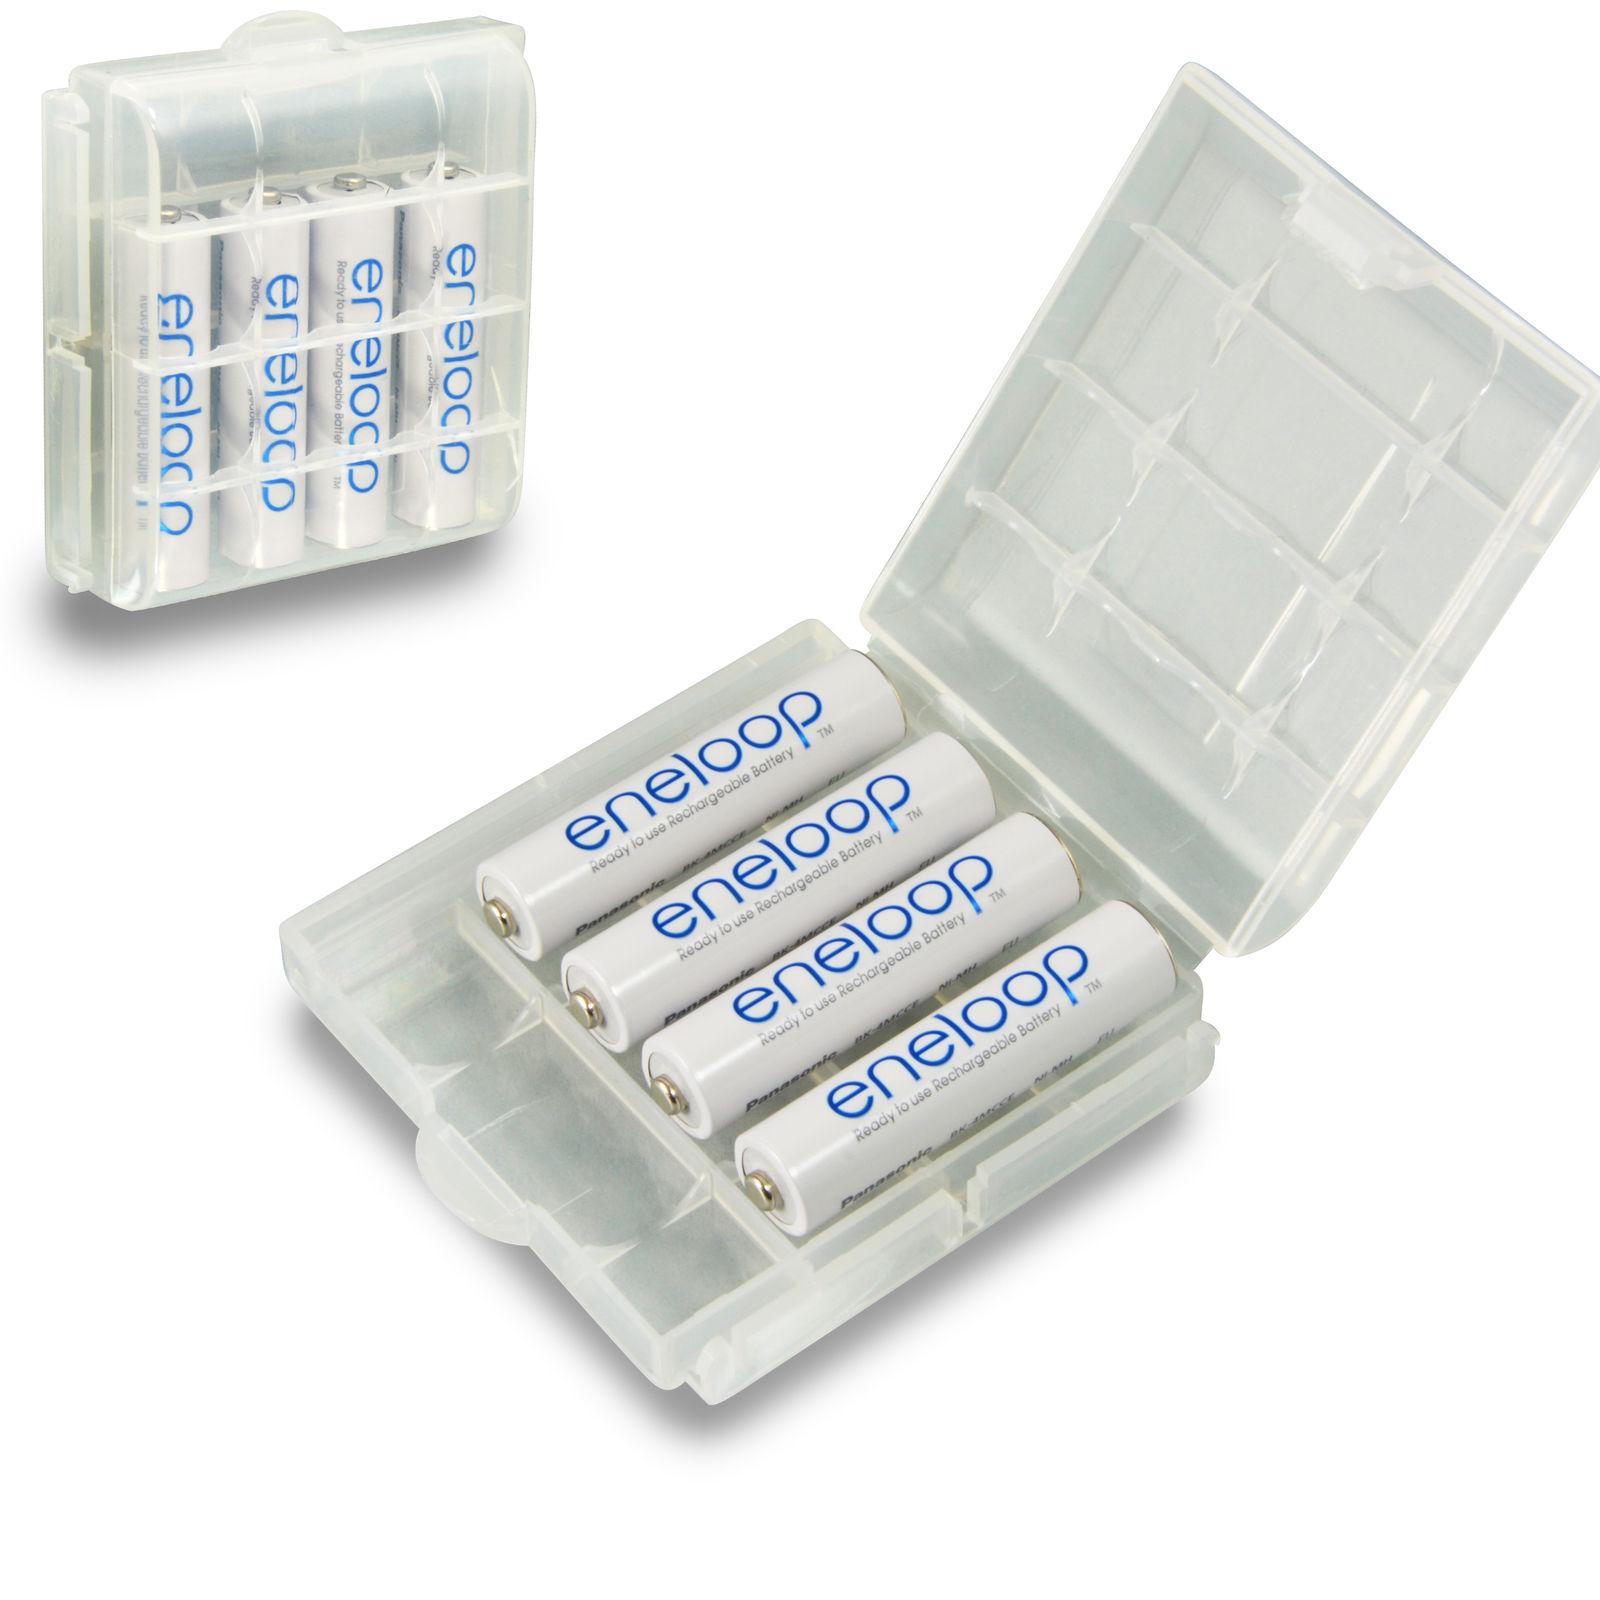 [Ebay.PL] 8x Panasonic Eneloop AAA Micro Akku LR03 800mAh + 2x Akku-Box = 5,58€ (Lieferung aus DE) oder die (AA Version LR06 für 9,59€)